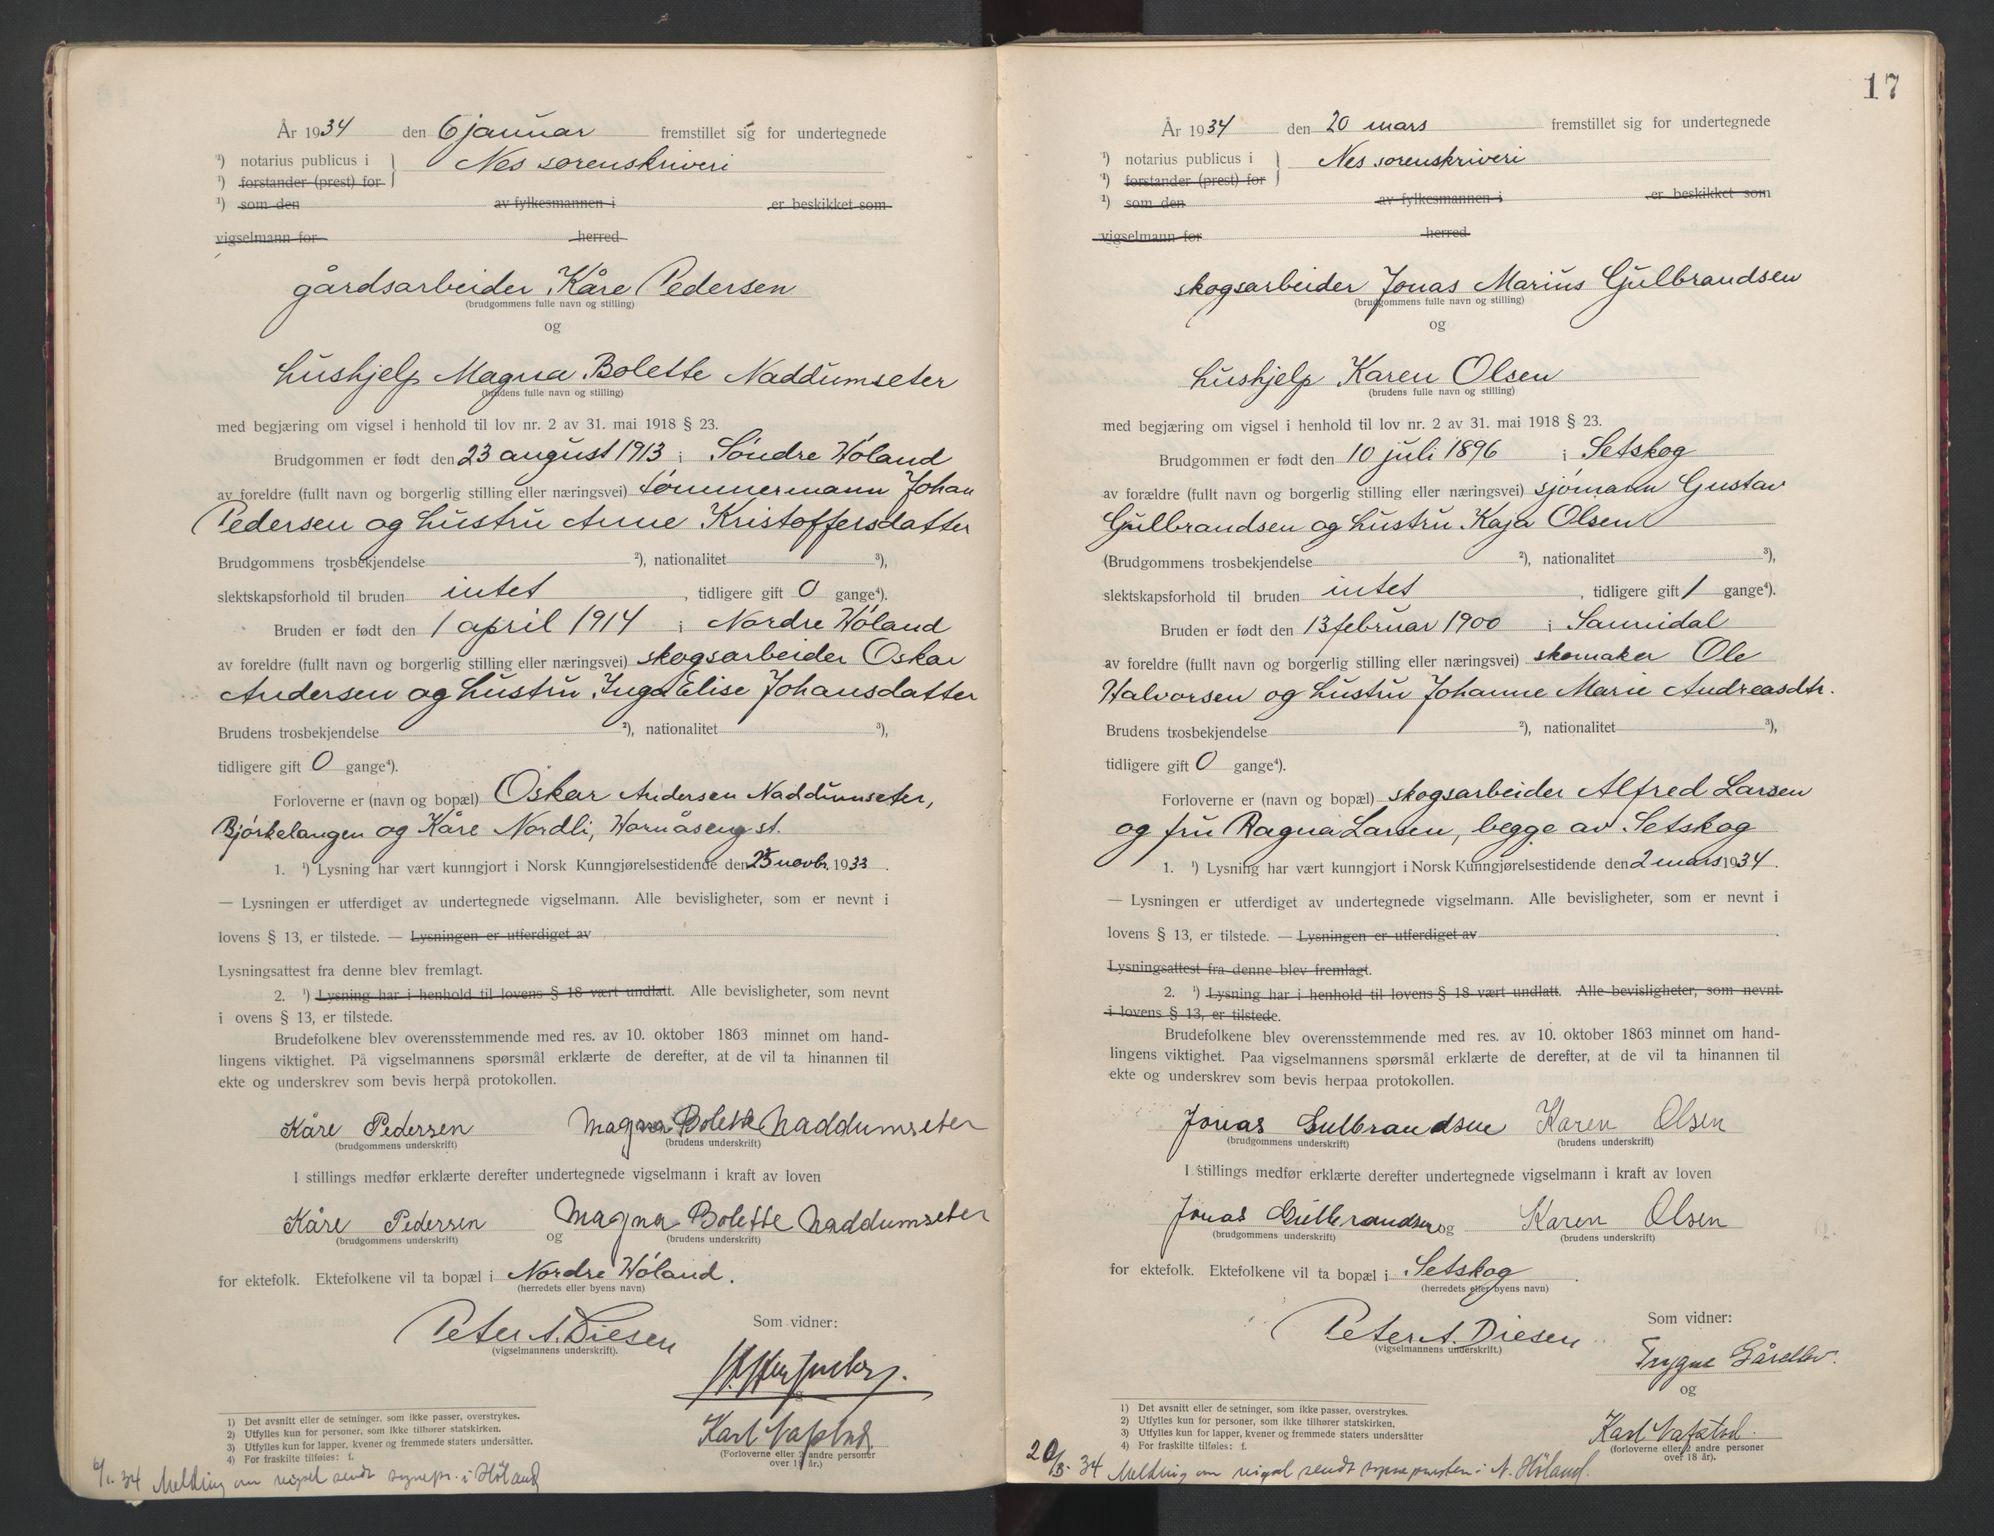 SAO, Nes tingrett, L/Lc/Lca/L0001: Vigselbok, 1920-1943, s. 17